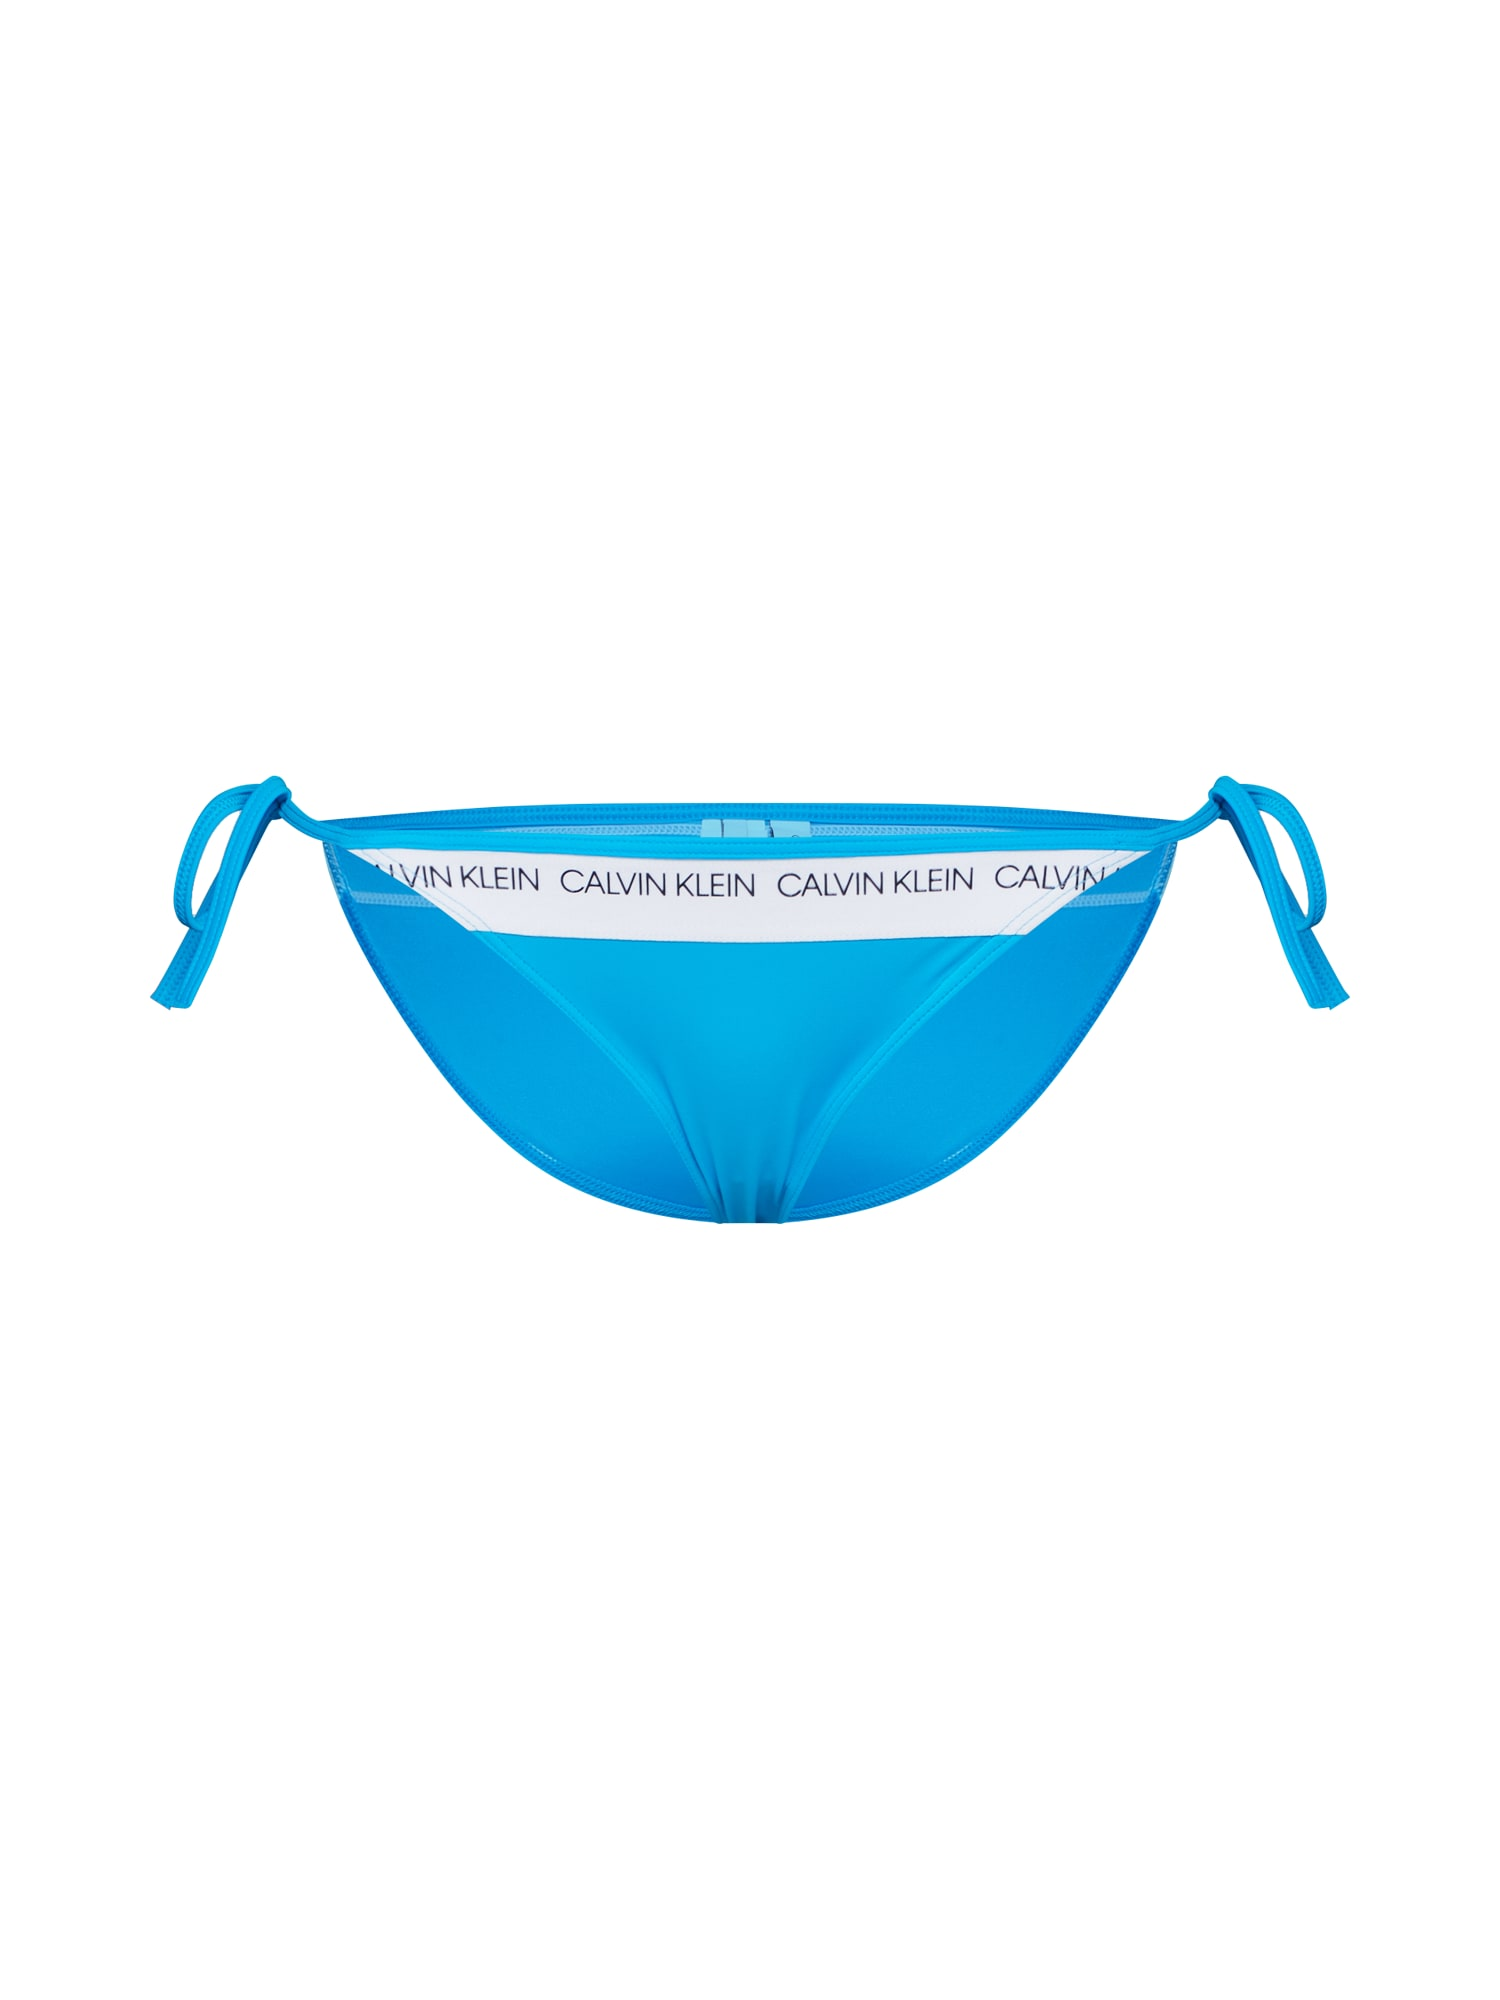 Spodní díl plavek STRING SIDE TIE modrá bílá Calvin Klein Swimwear